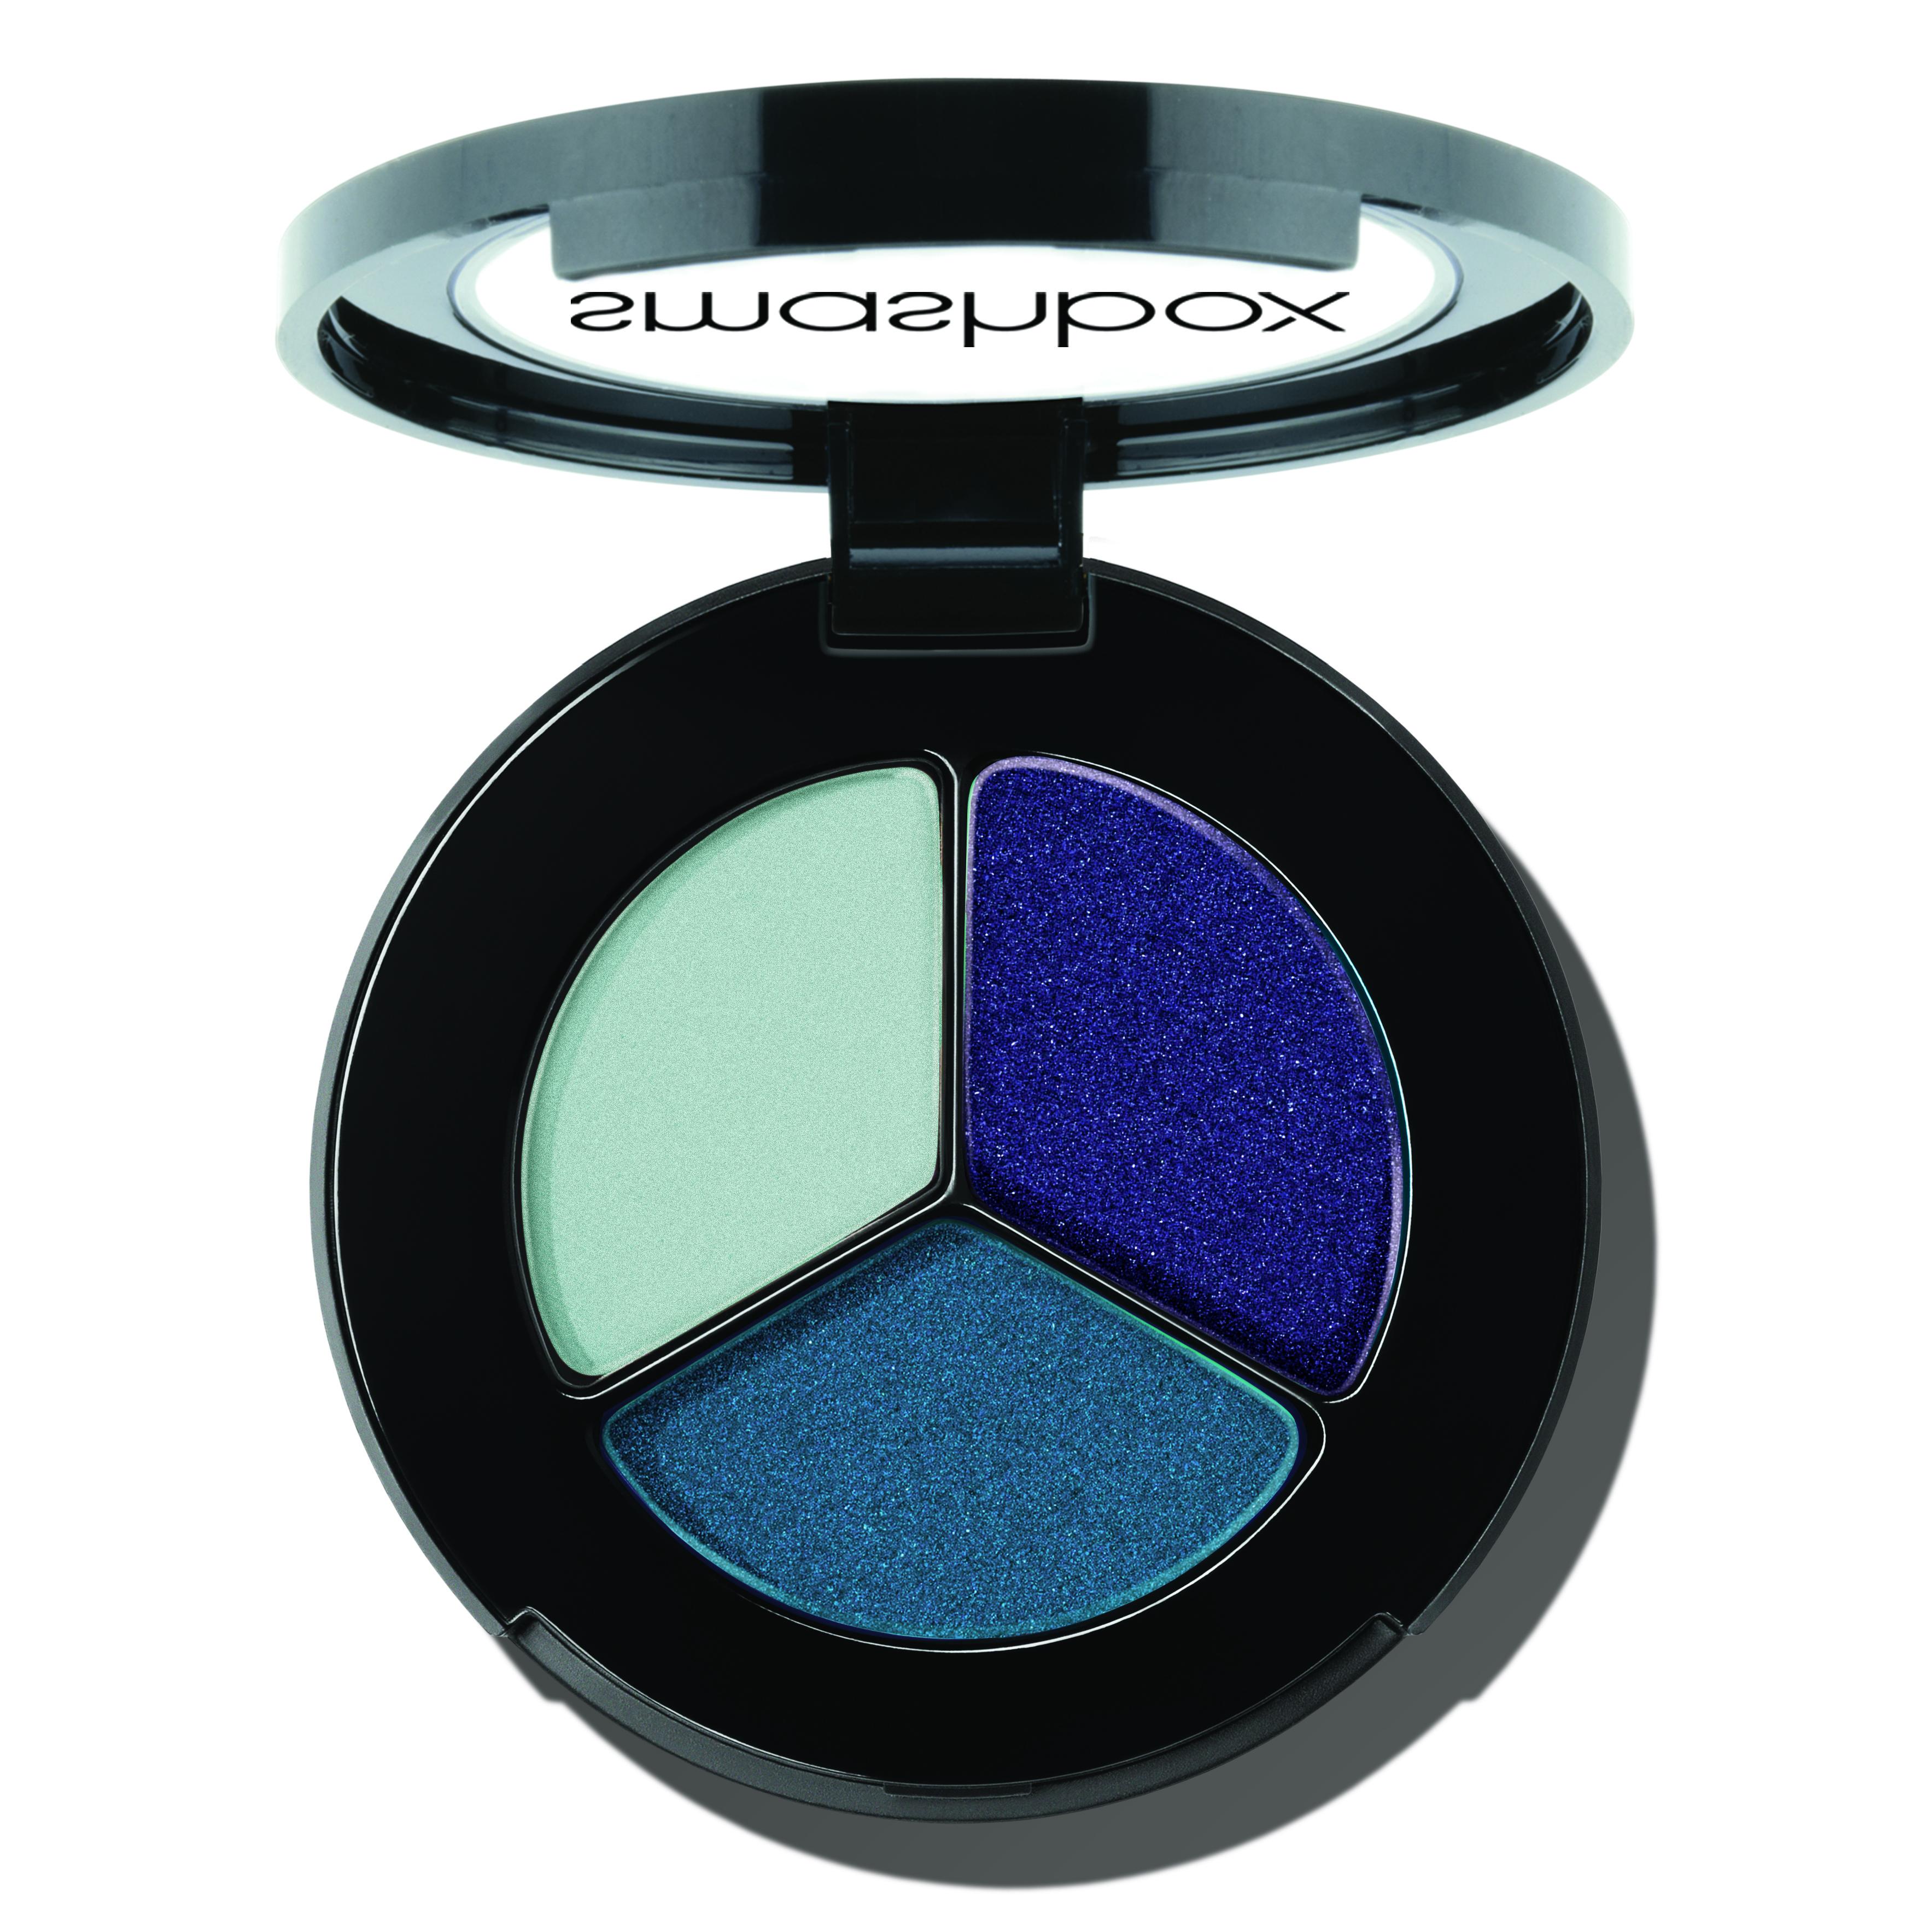 Smashbox eye shadow trio Blueprint